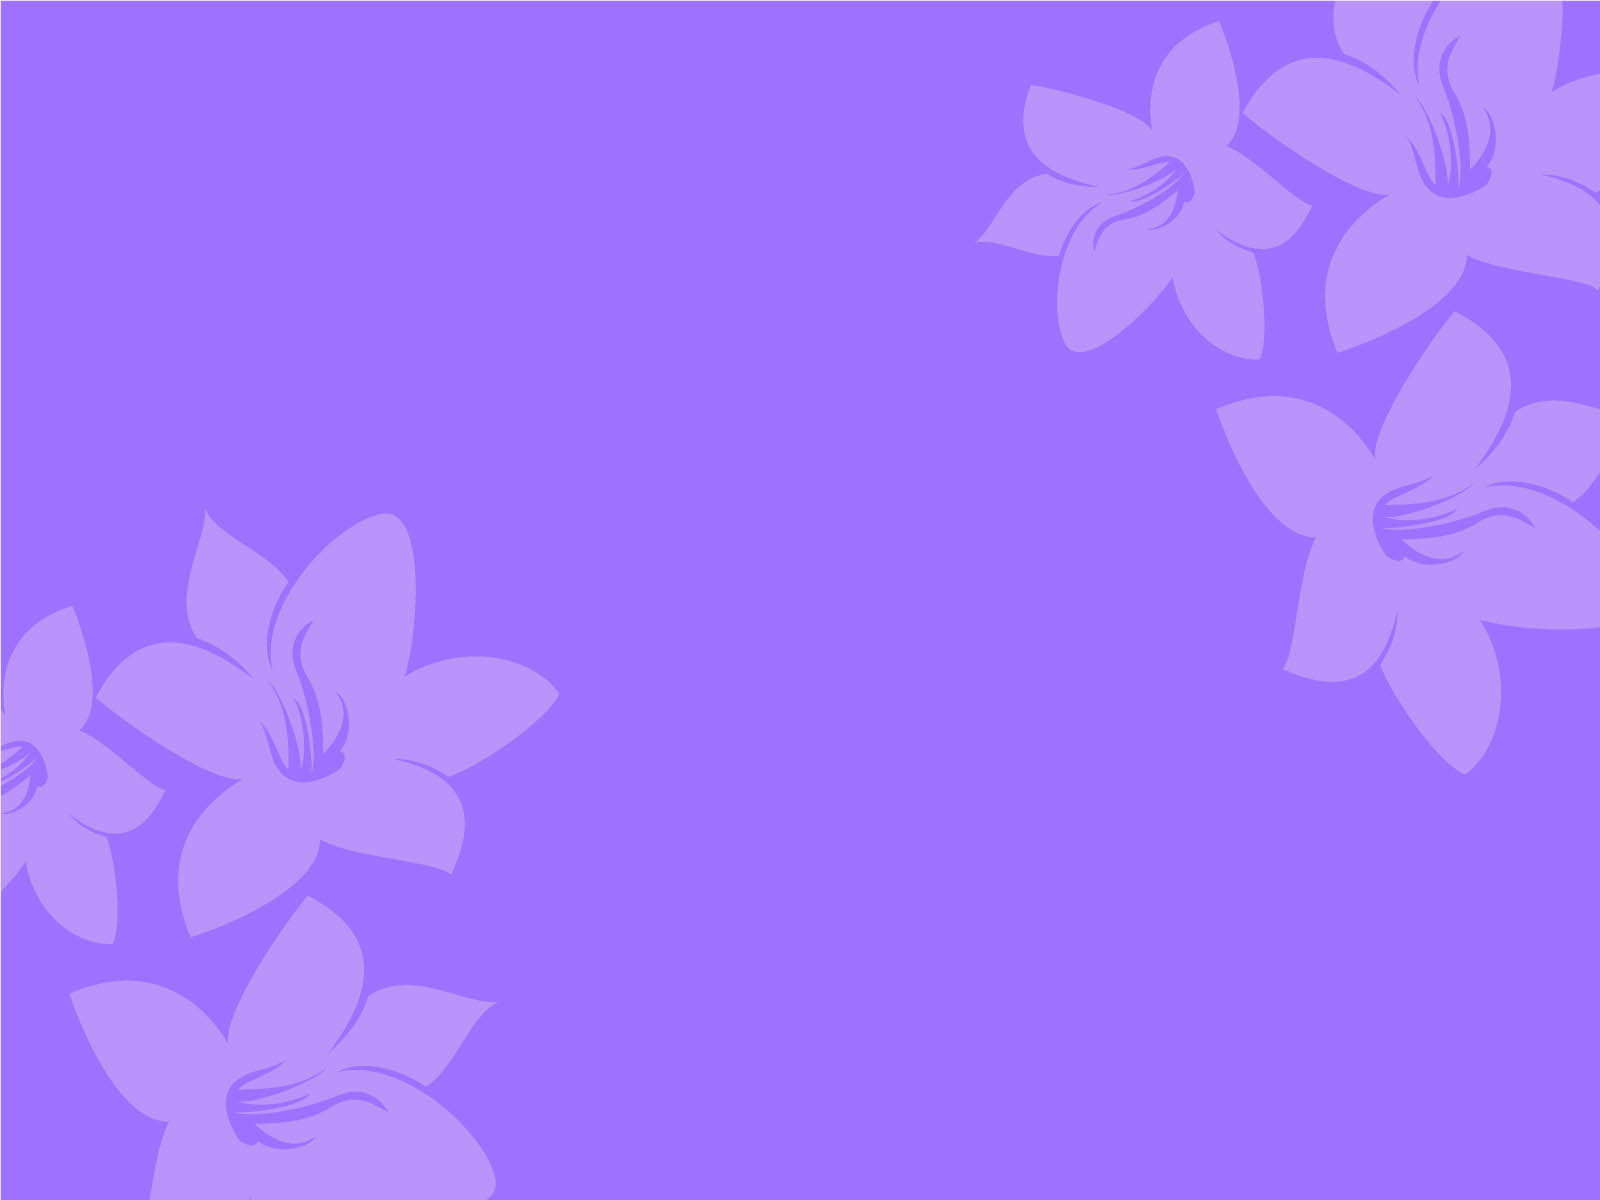 purple wallpapers abstract purple desktop wallpapers abstract purple 1600x1200